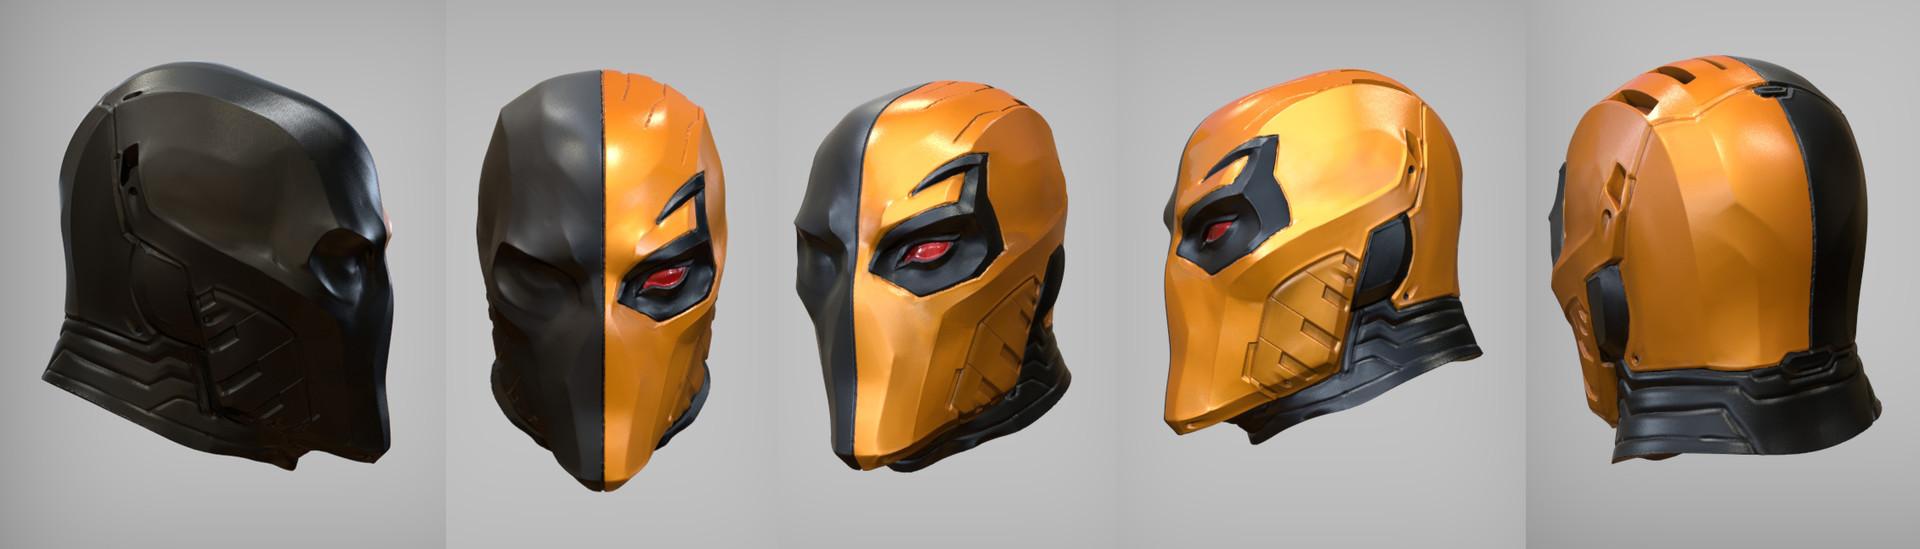 David giraud deathstroke mask